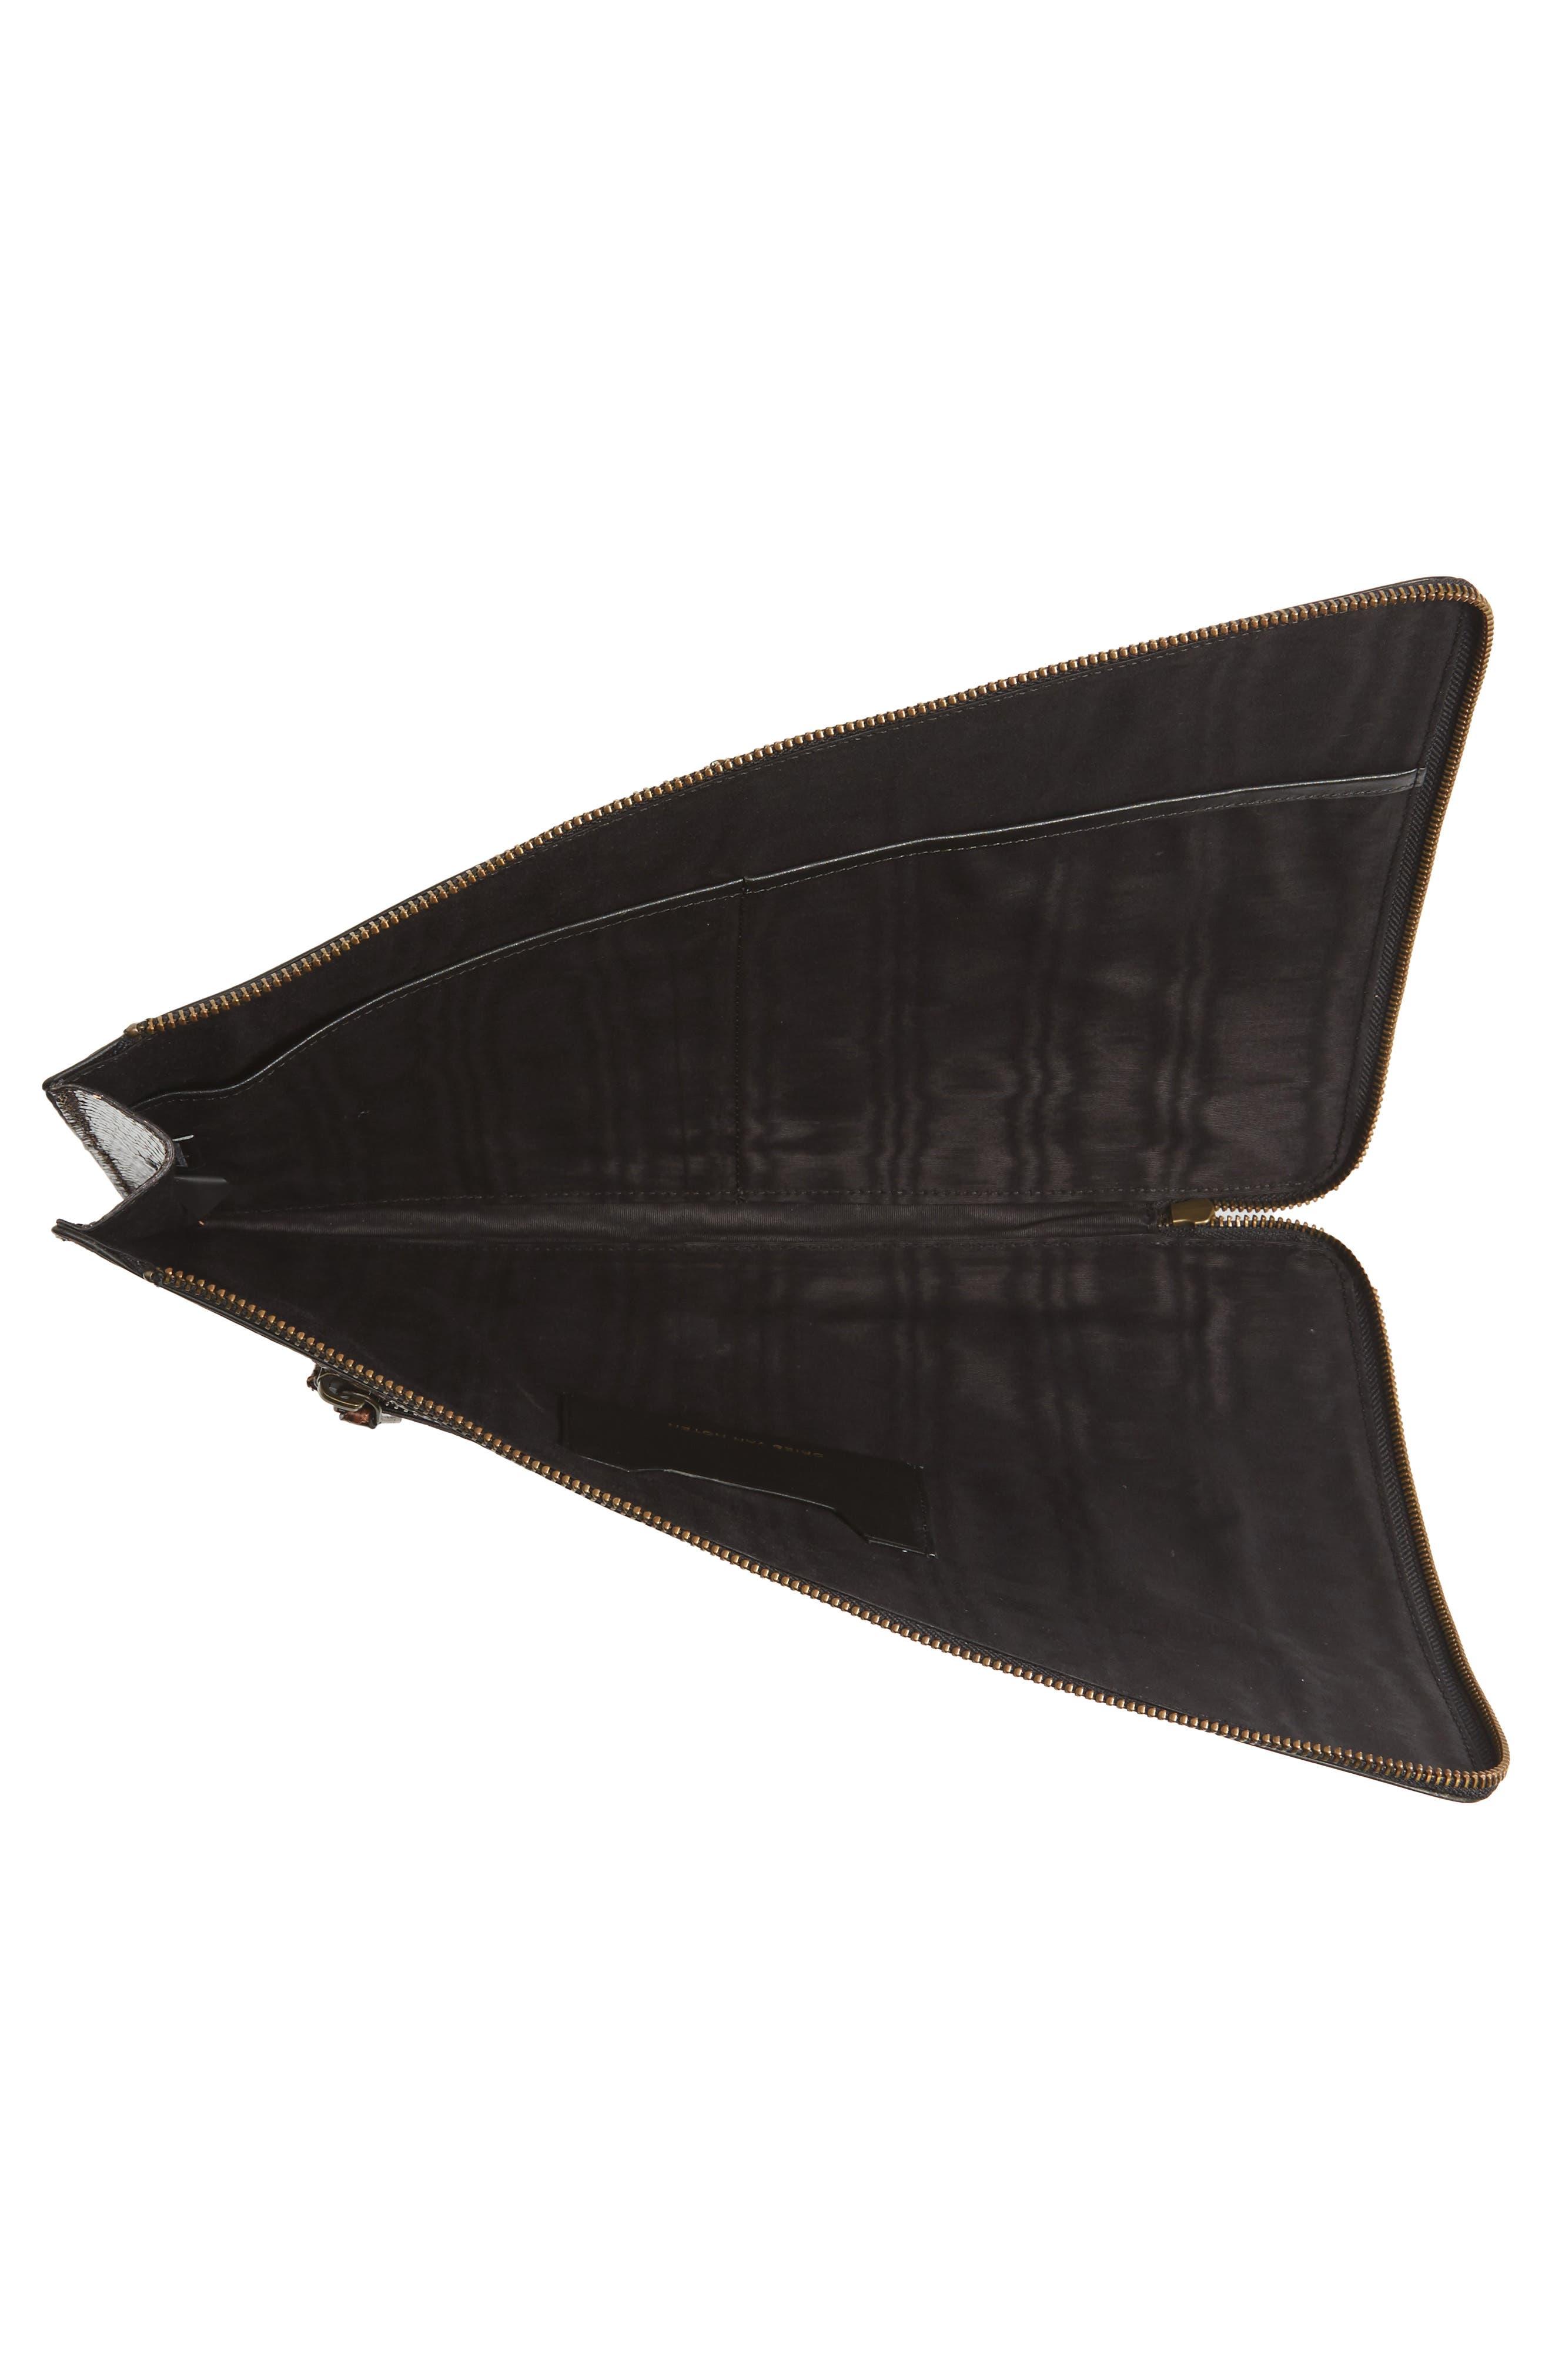 Leather Laptop Sleeve,                             Alternate thumbnail 2, color,                             200